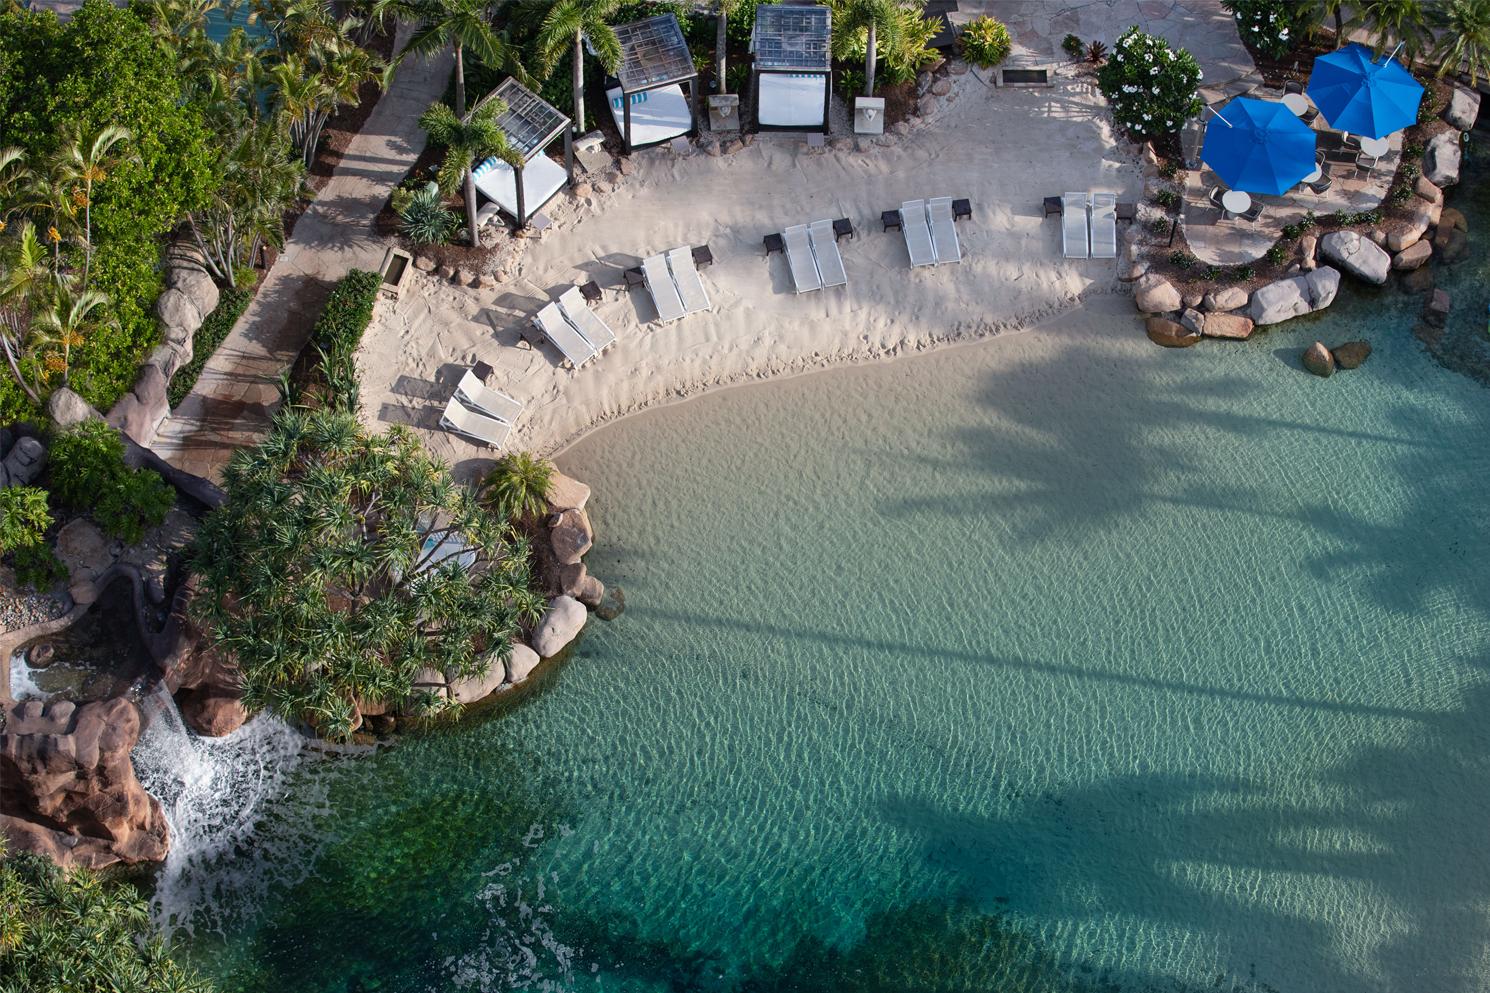 Marriott Vacation Club<span class='trademark'>℠</span> at Surfers Paradise . Marriott Vacation Club<span class='trademark'>℠</span> at Surfers Paradise is located in Gold Coast, Surfers Paradise Australia.